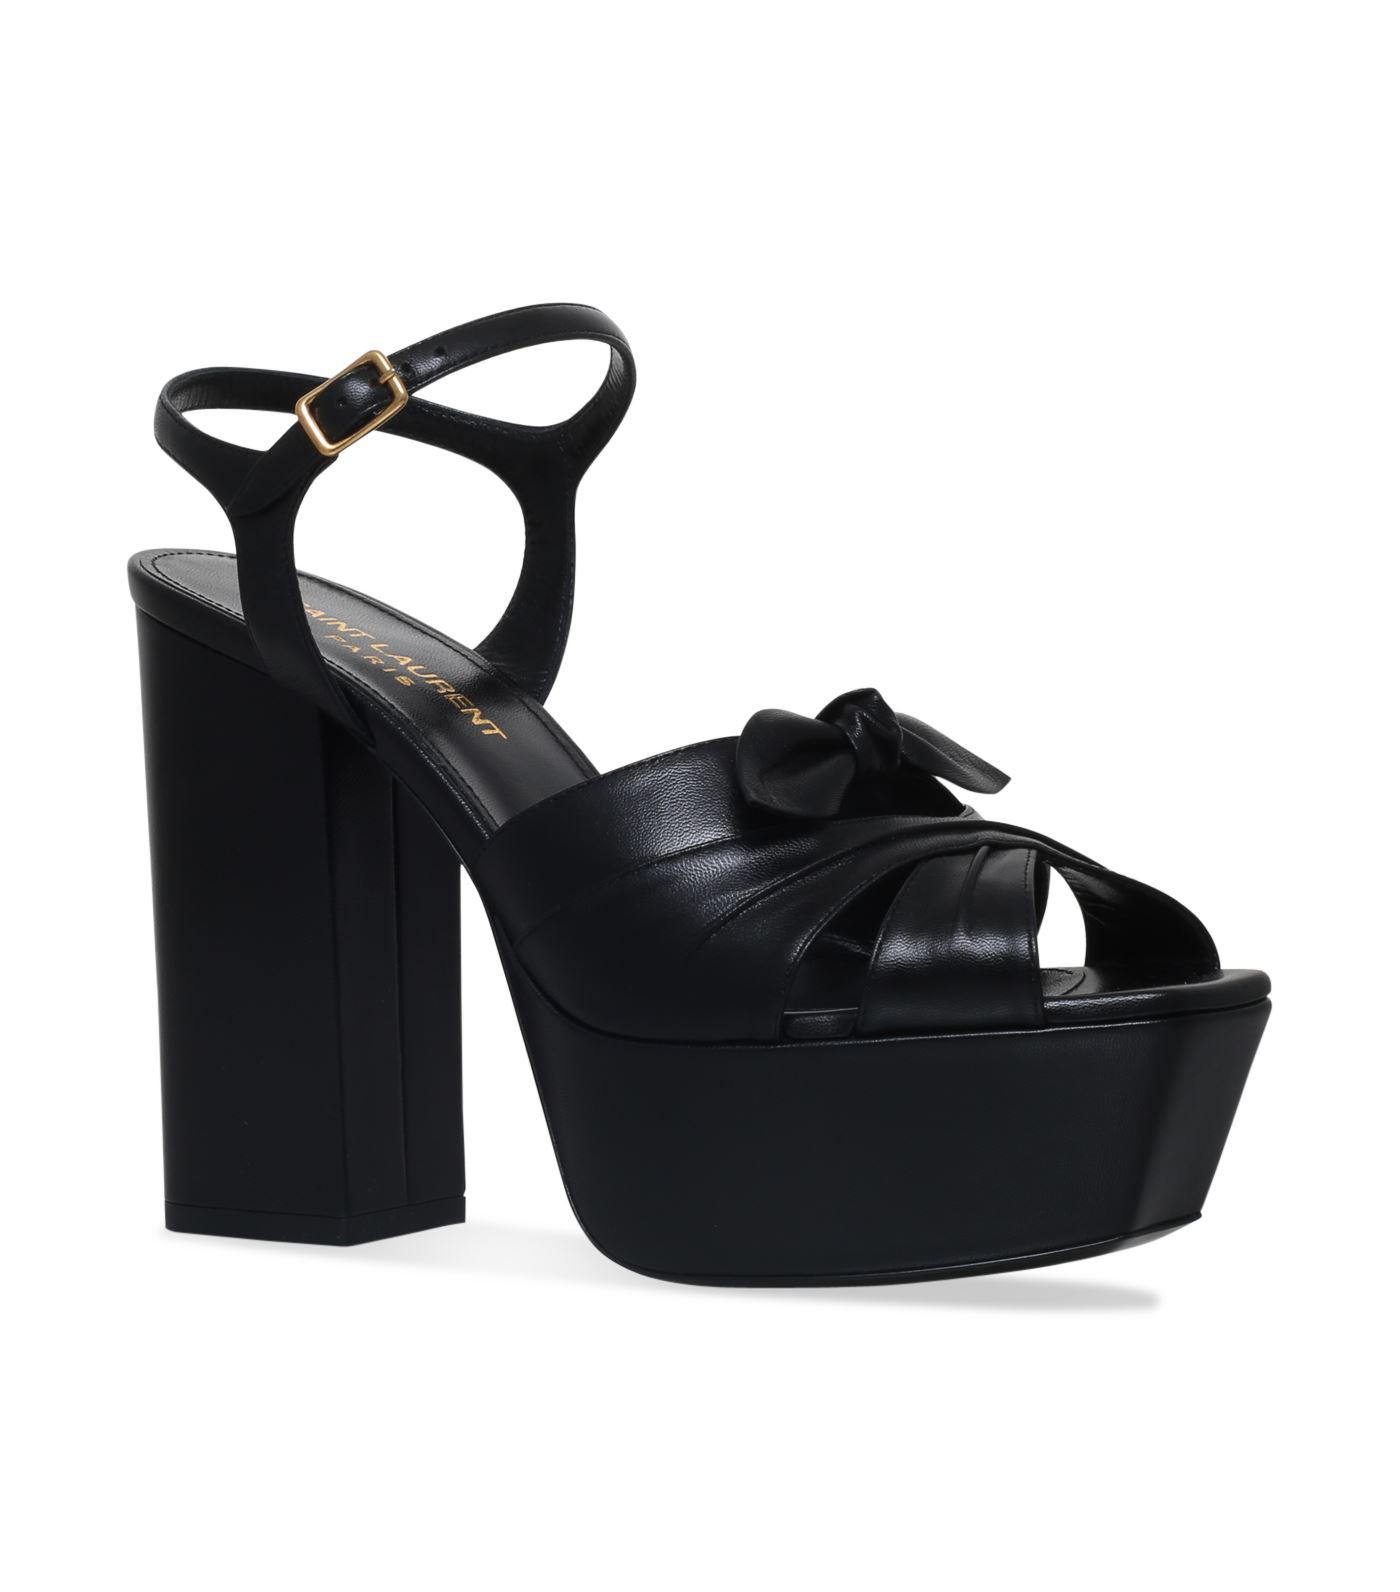 b45370bffe7 Lyst - Saint Laurent Farrah Bow Sandals in Black - Save 15%